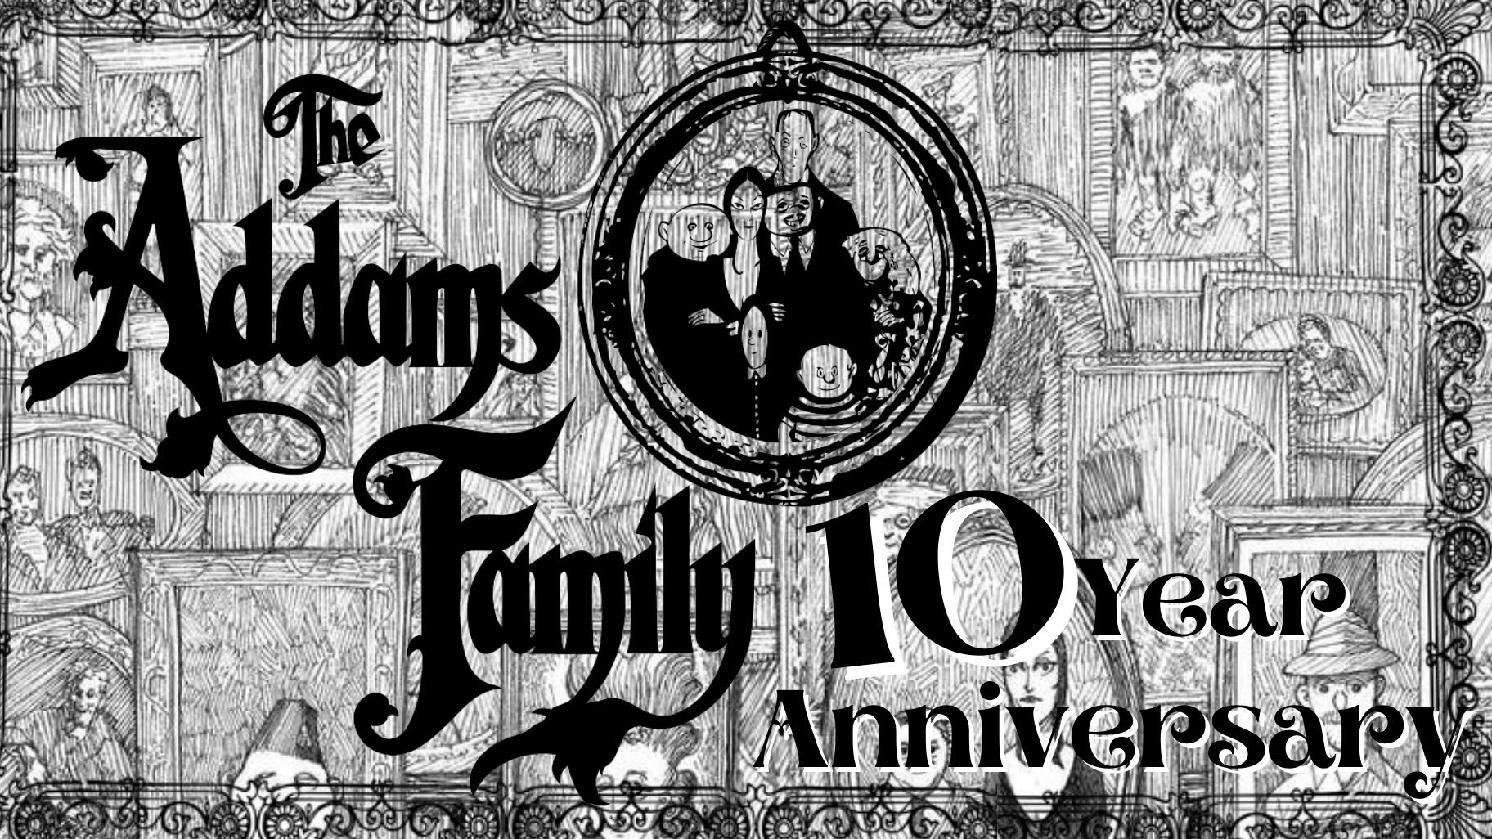 Envoute's Addams Family 10 Year Anniversary Gala w/Divine Hand Ensemble